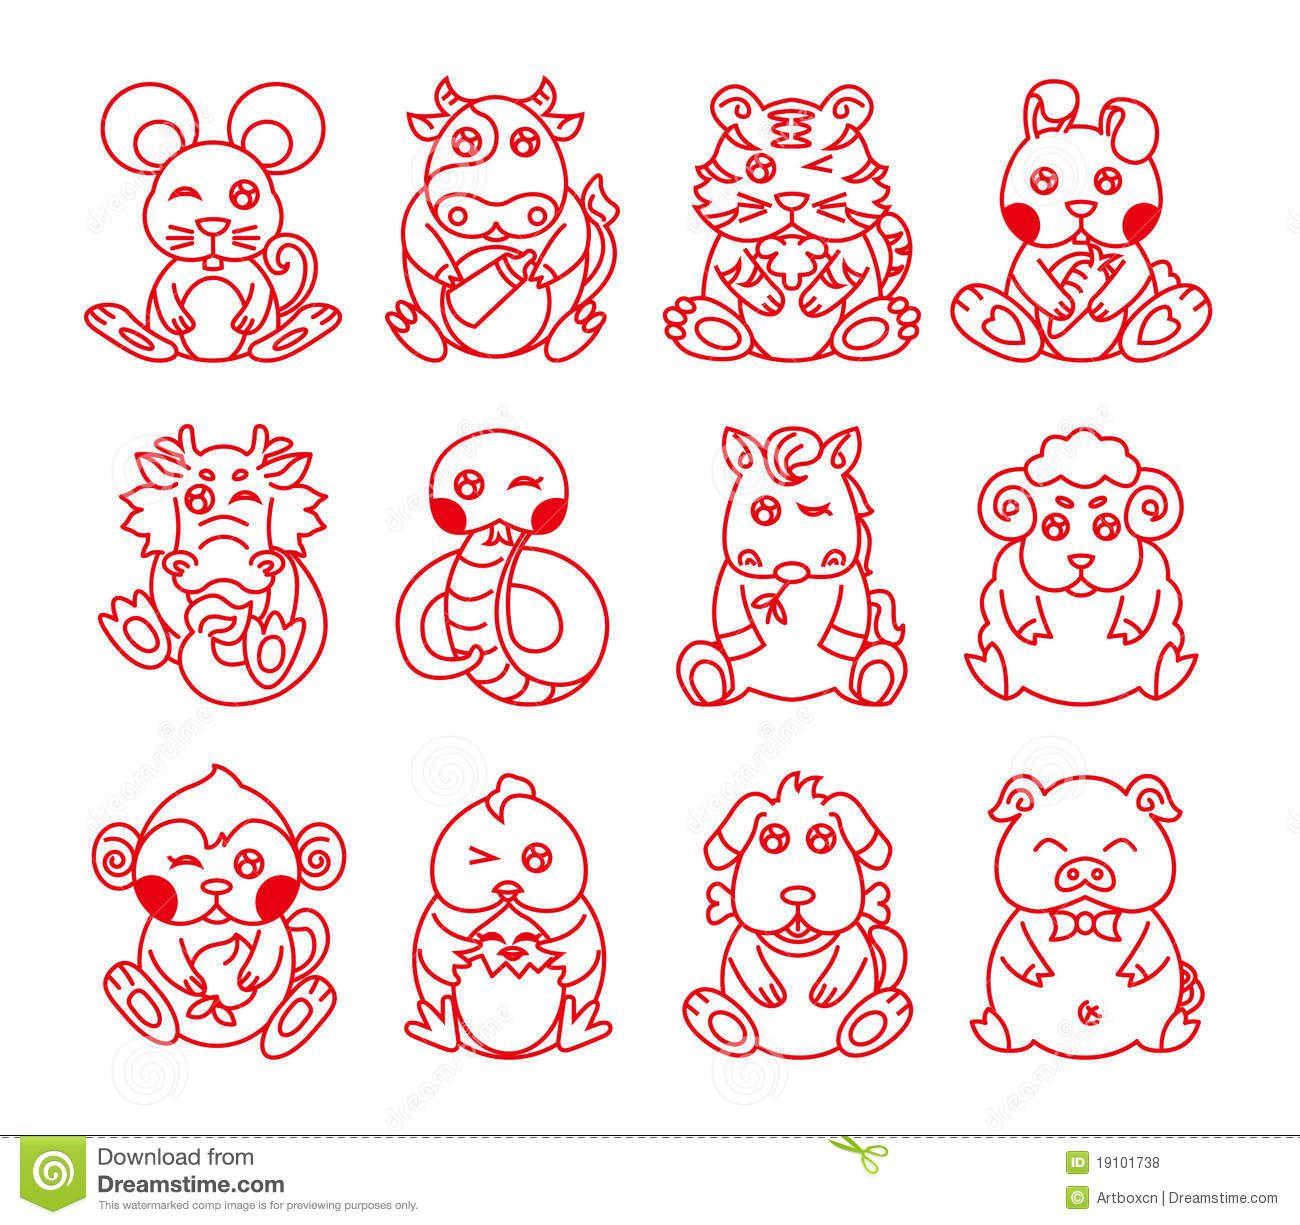 Chinese new year animals meaning royalty free stock photos chinese new year animals meaning royalty free stock photos chinese ancient zodiac animal year buycottarizona